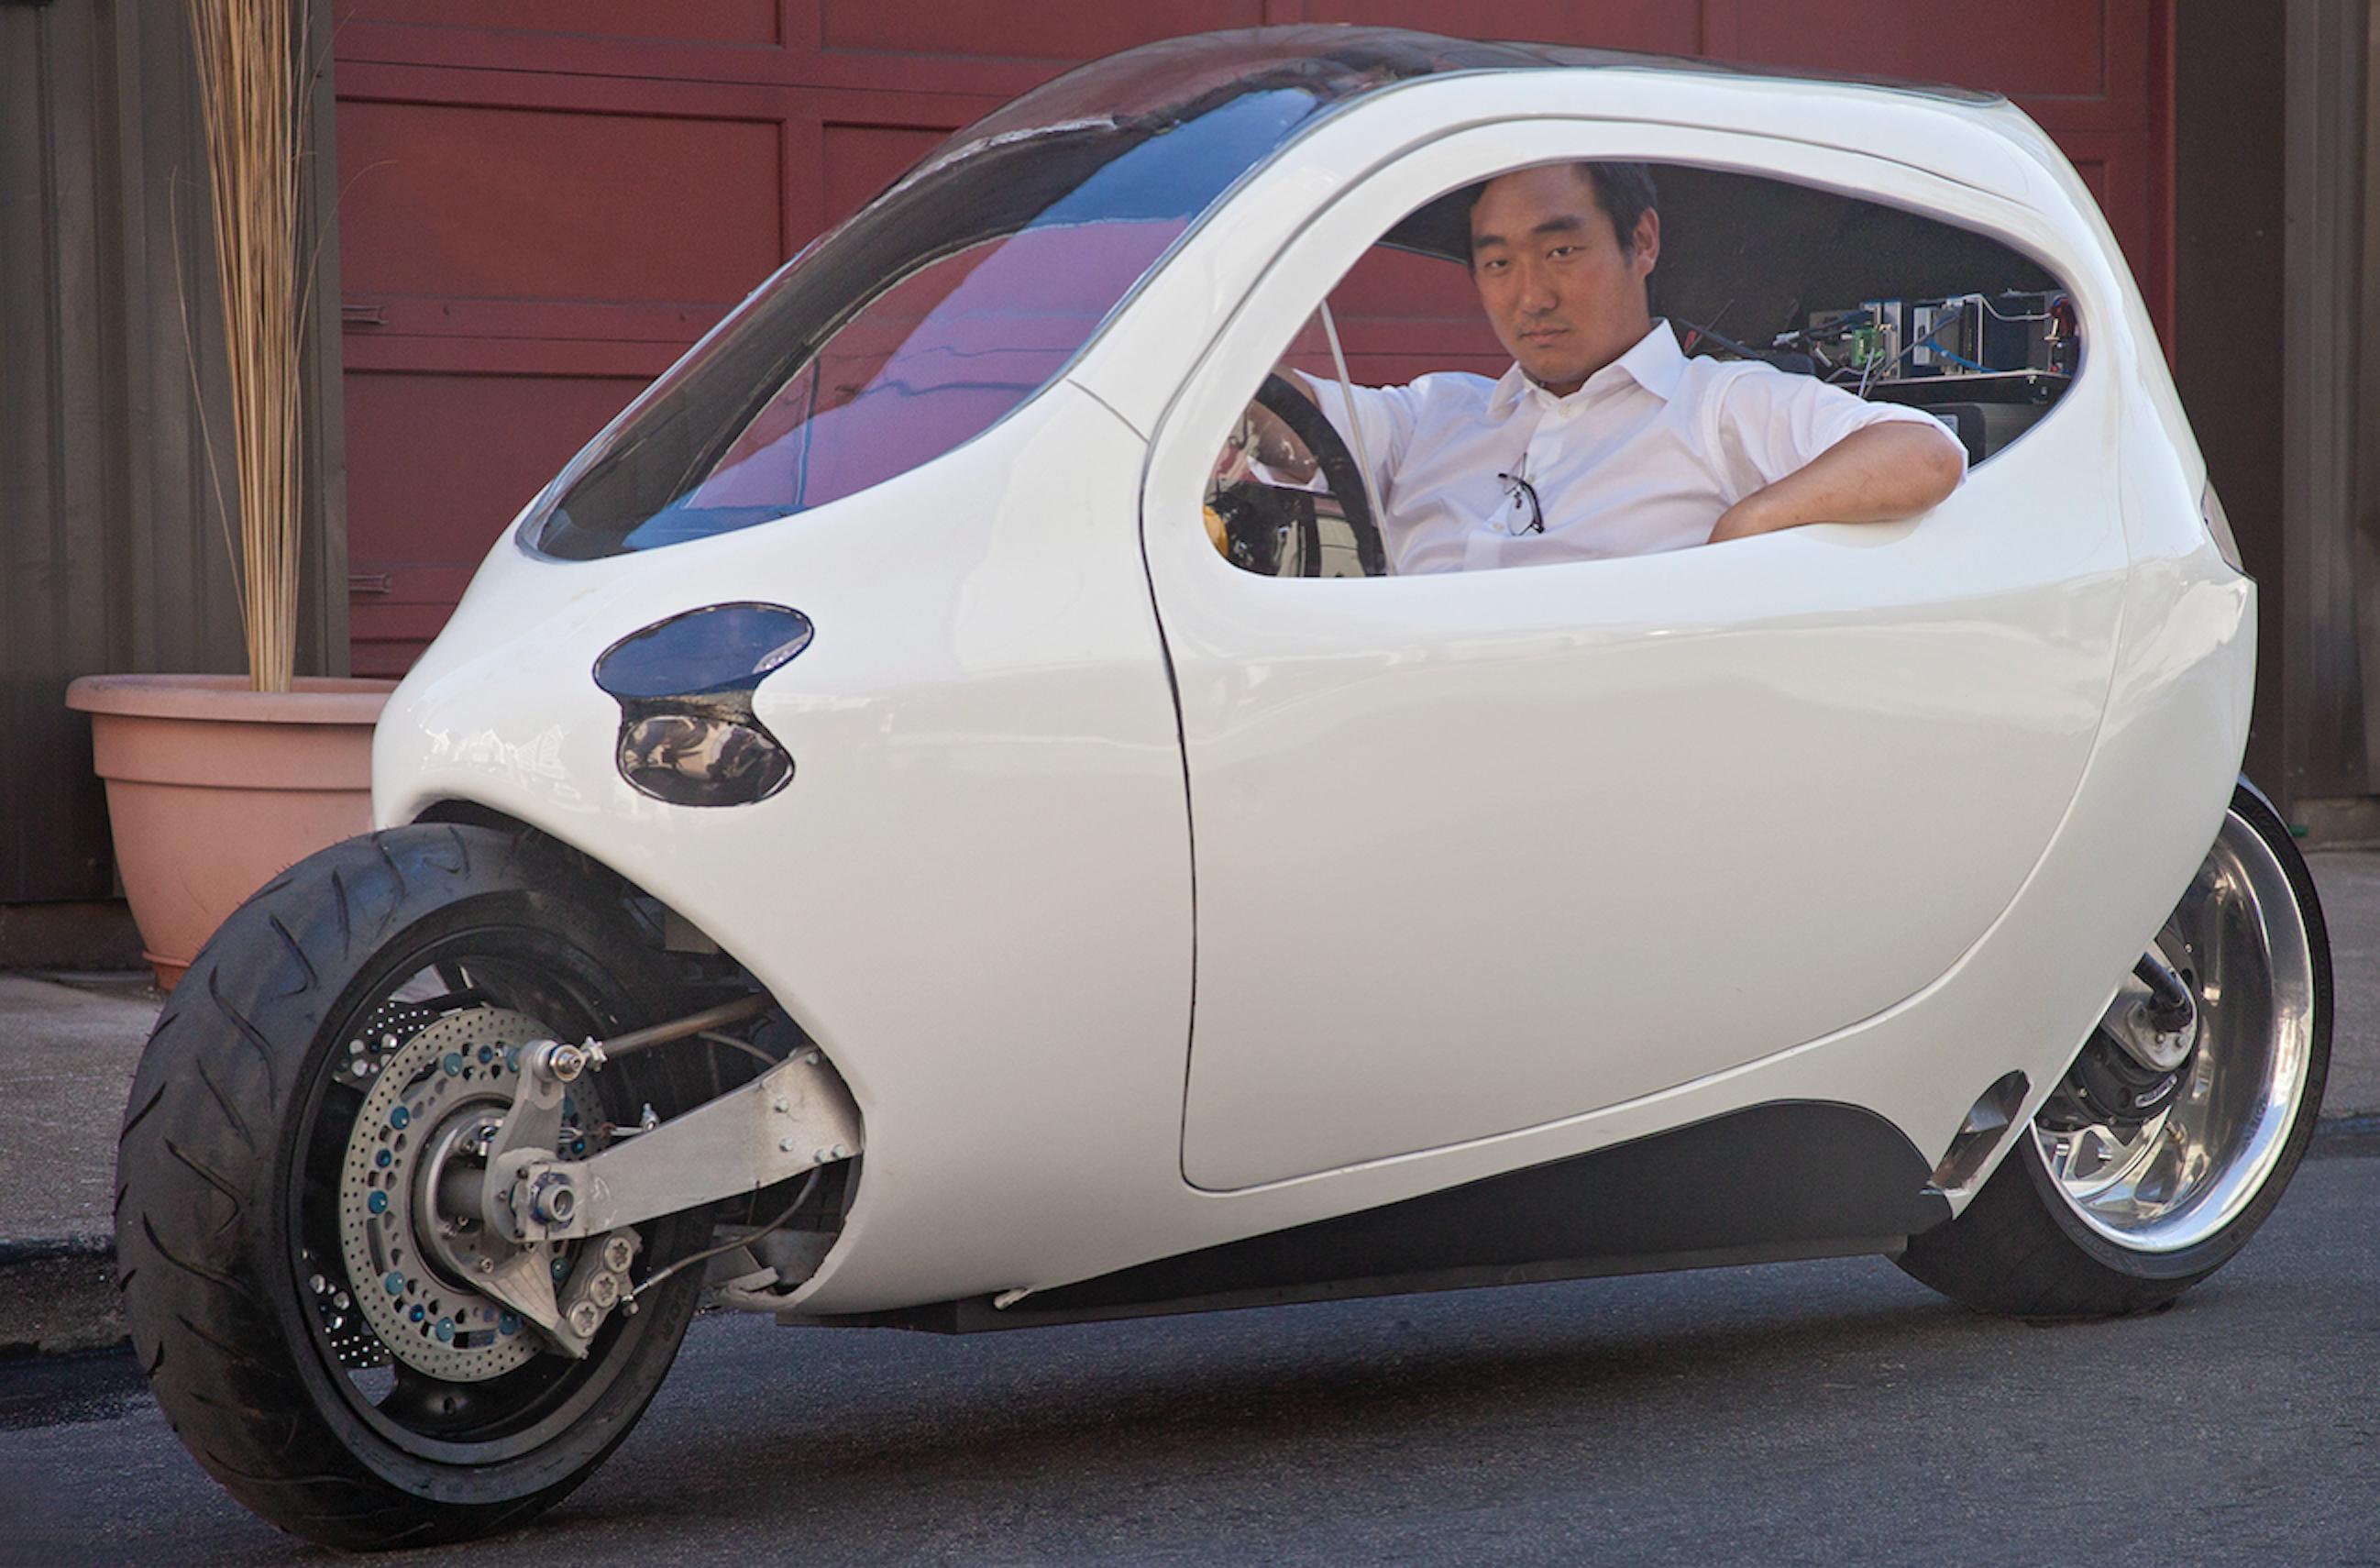 Lit Motors Self-Balancing Motorcyle